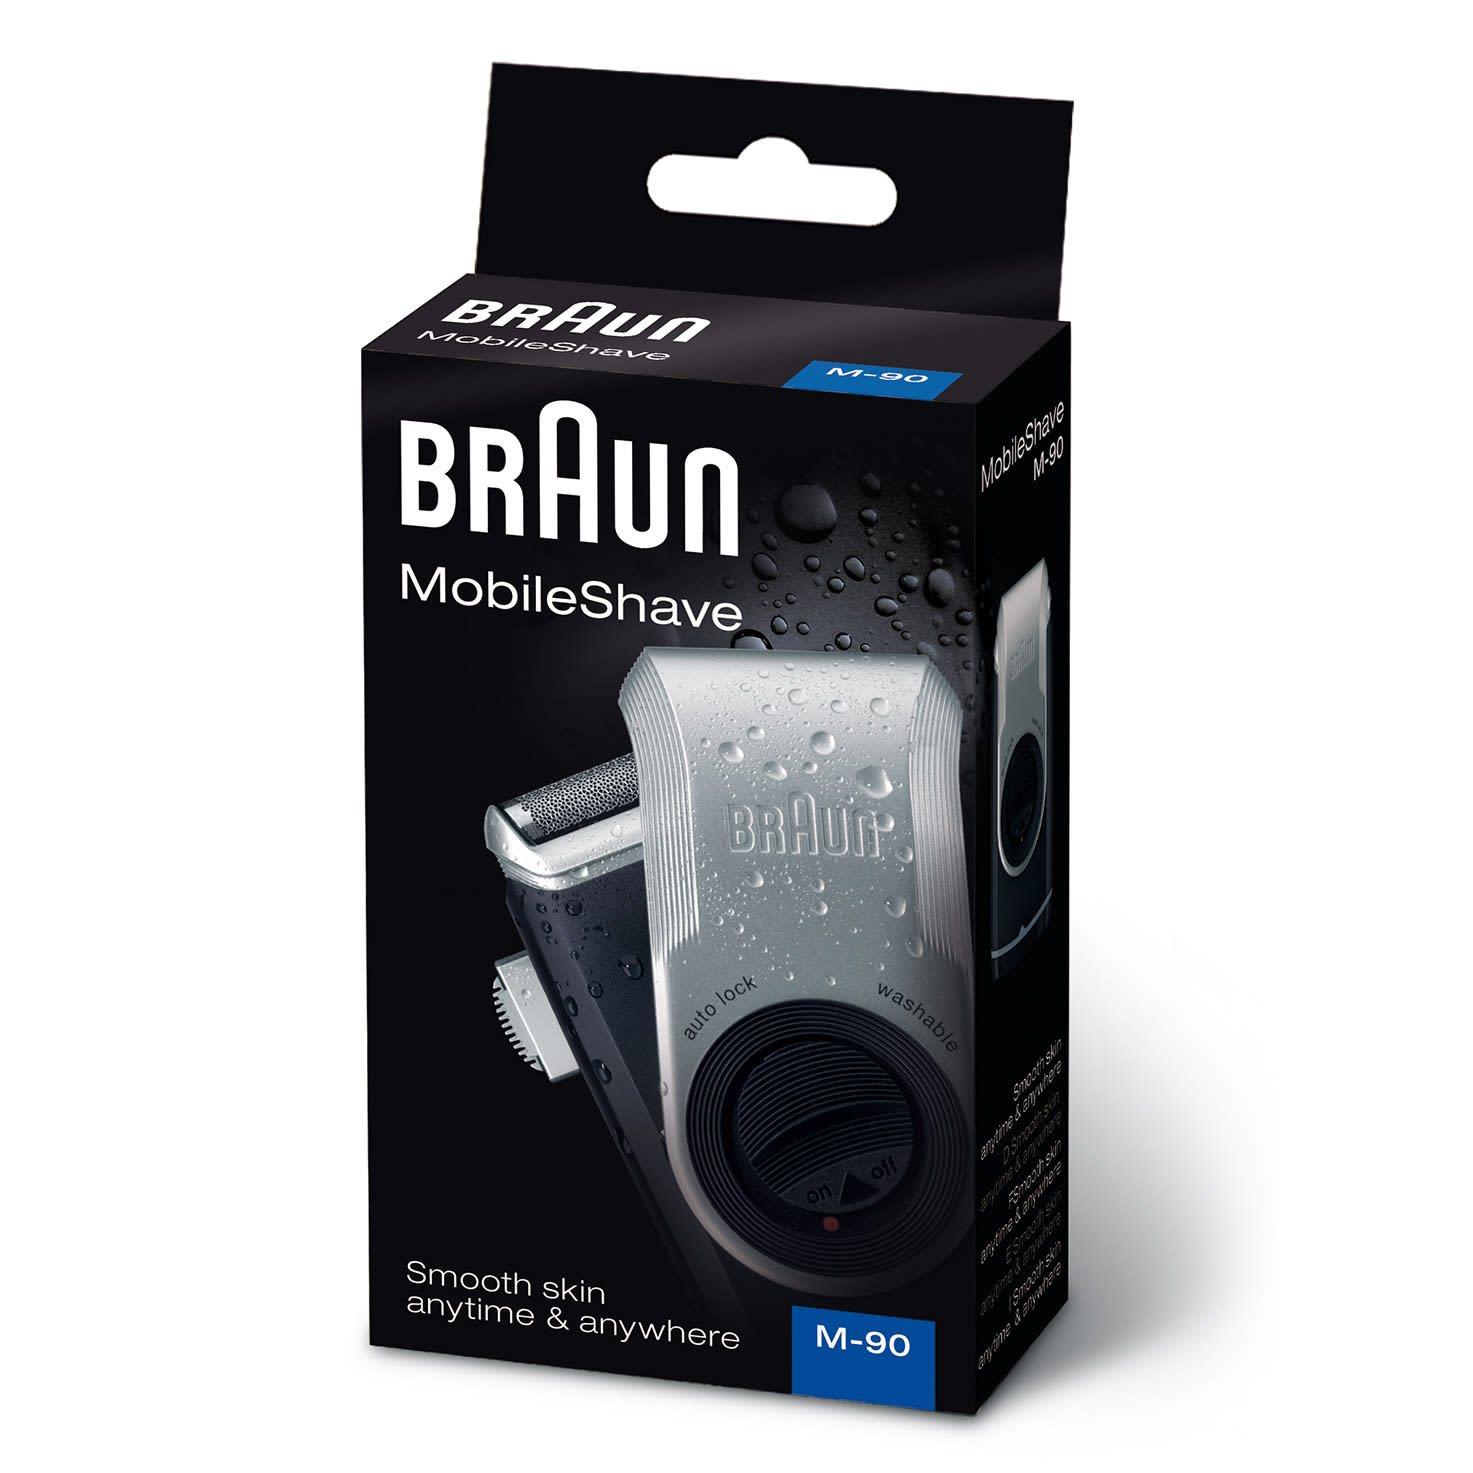 Braun MobileShave M-90 Mens Shaver (Dark Blue/Silver)